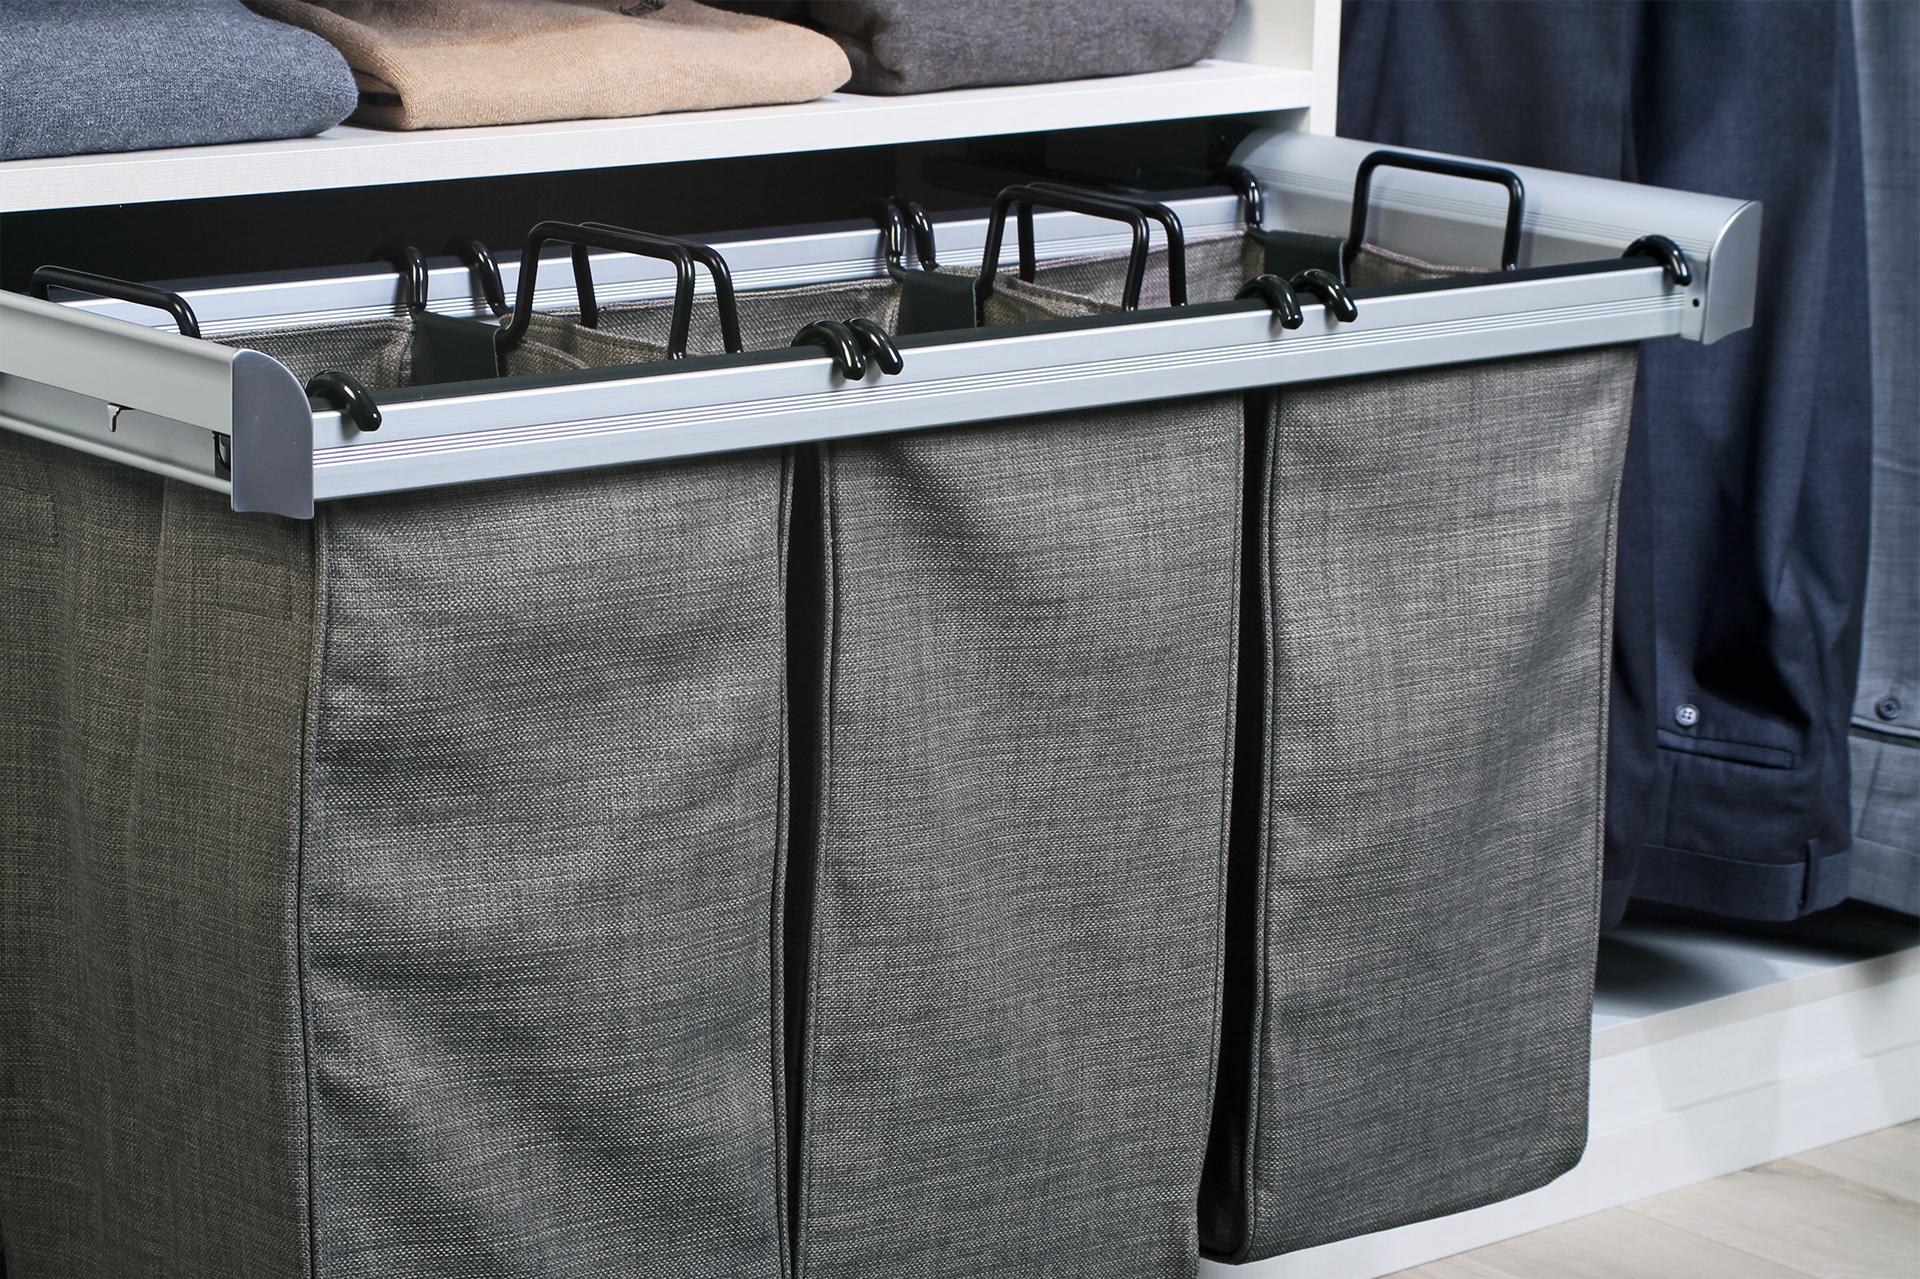 ENGAGE_Laundry-Organizer-3Bags_MAL